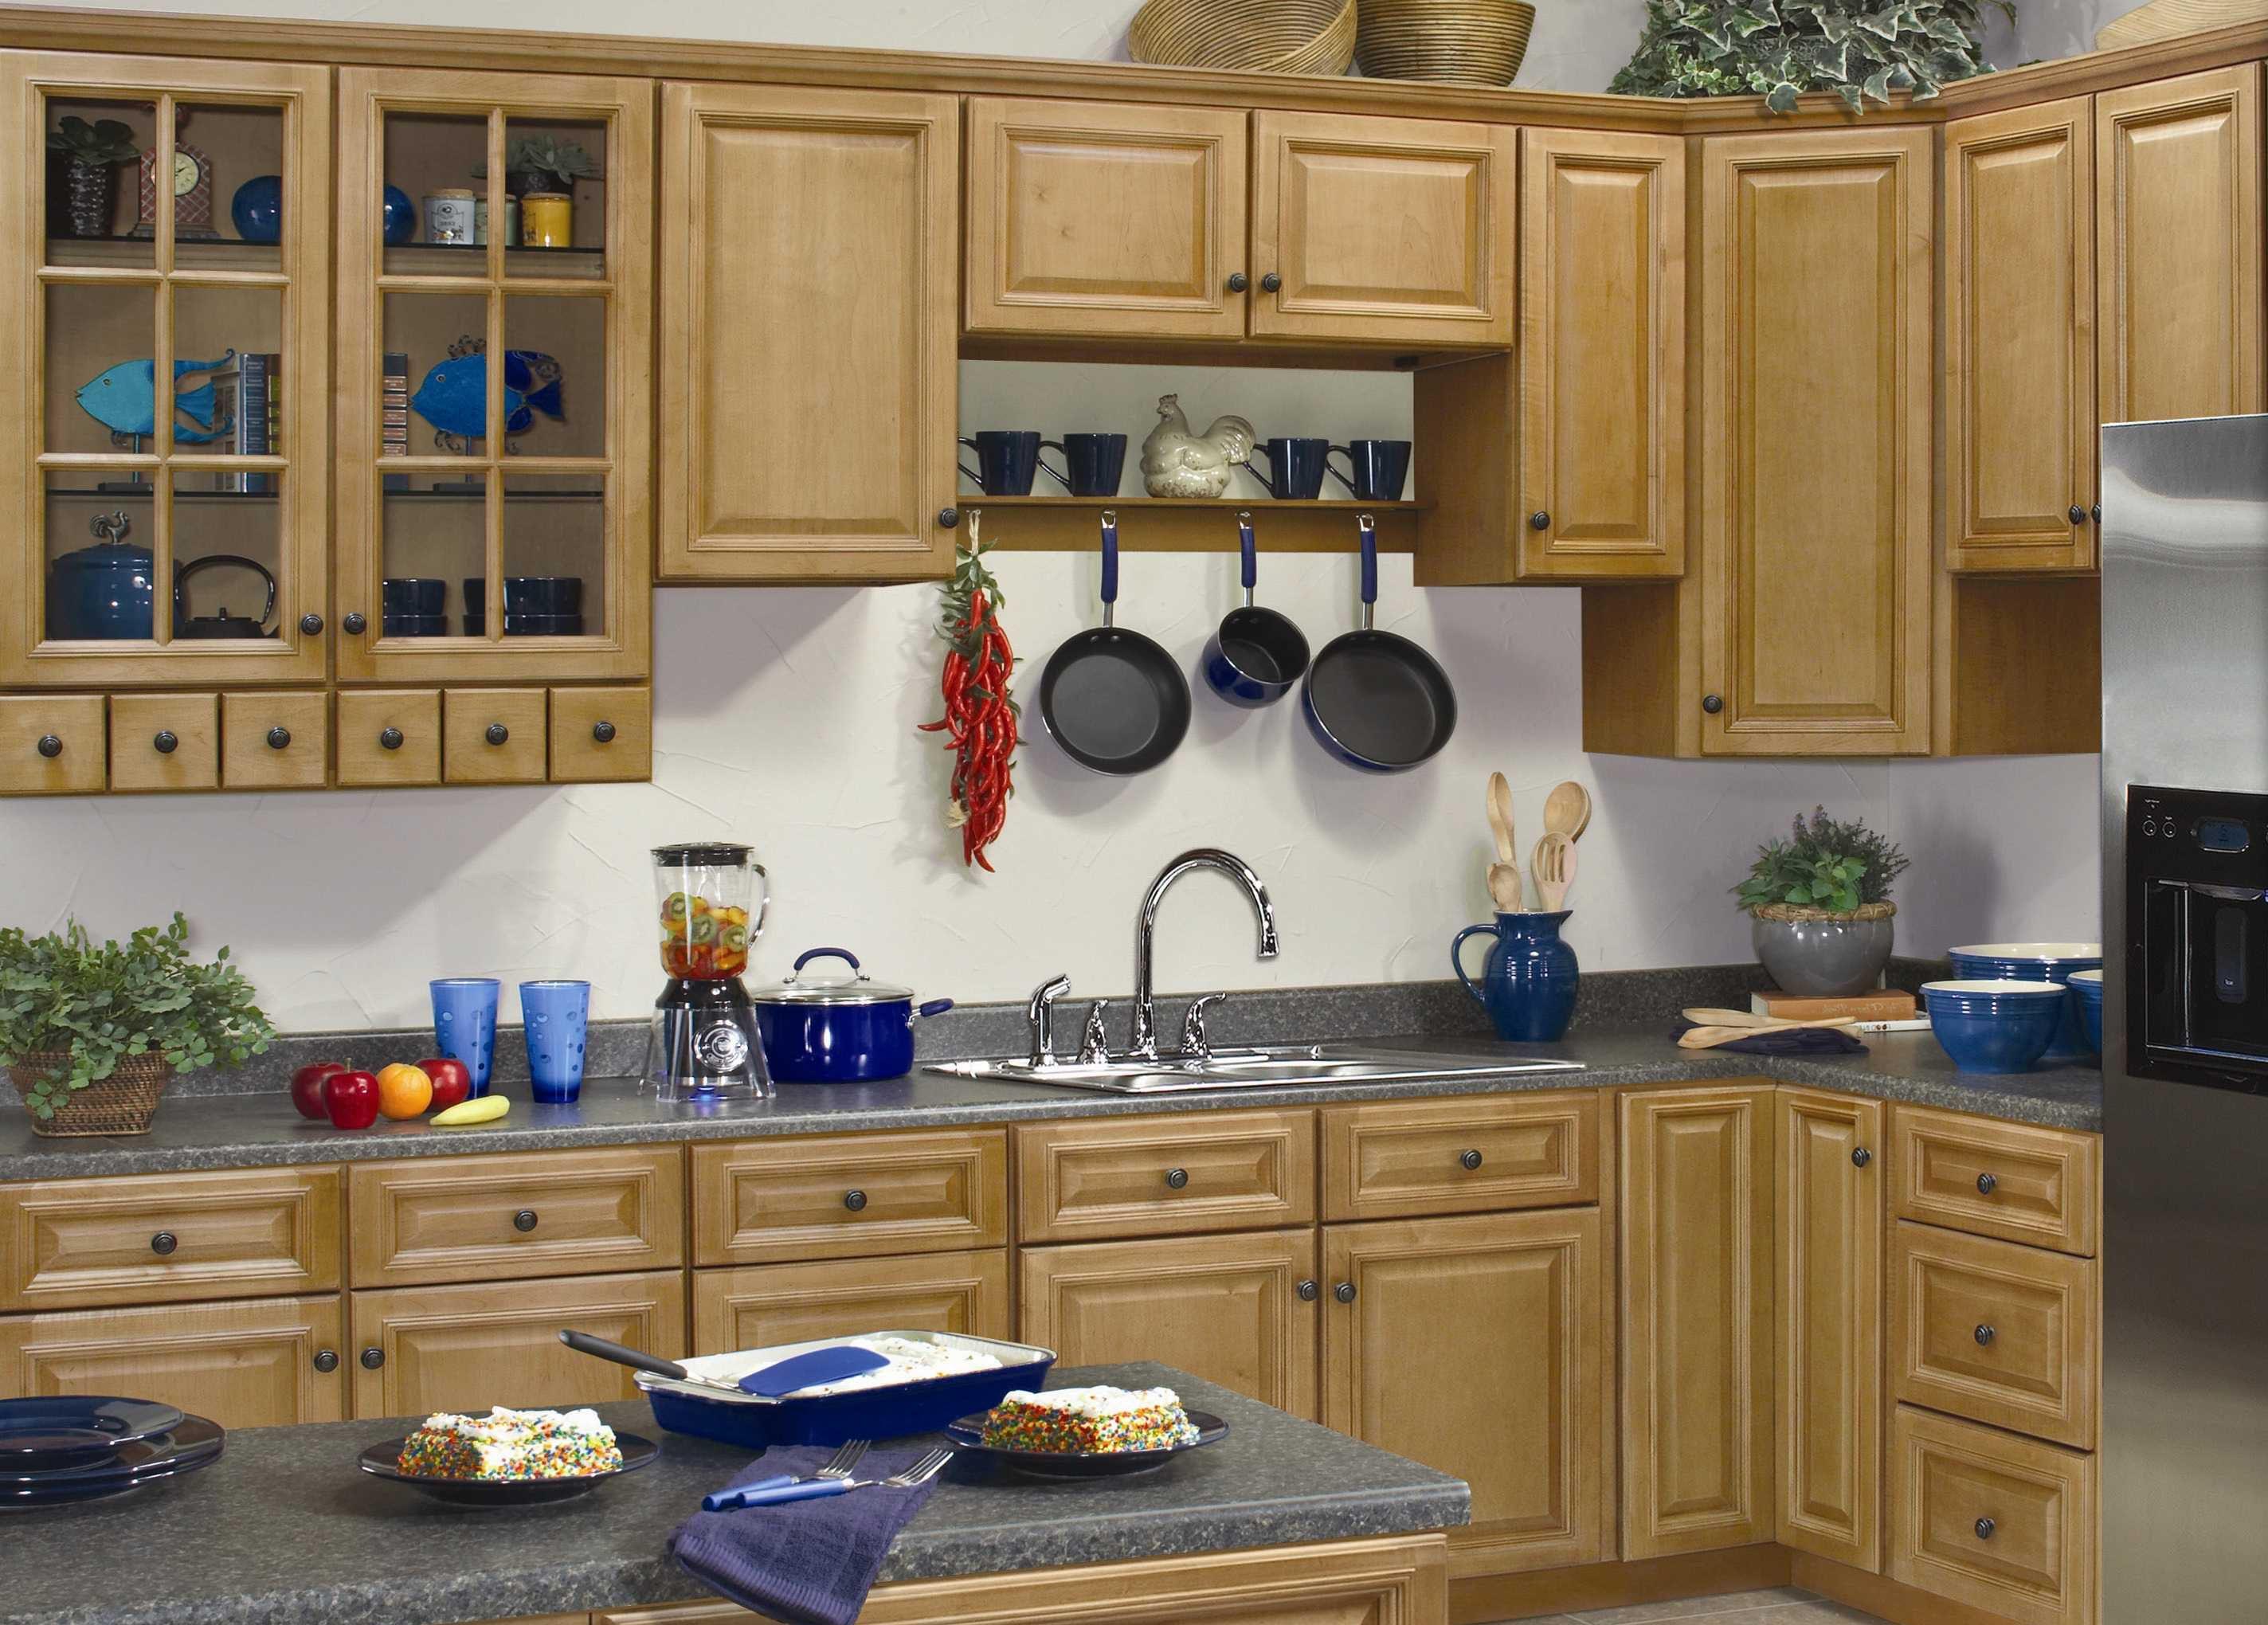 Sunnywood Kitchen Cabinets Sunnywood Kitchen Cabinets